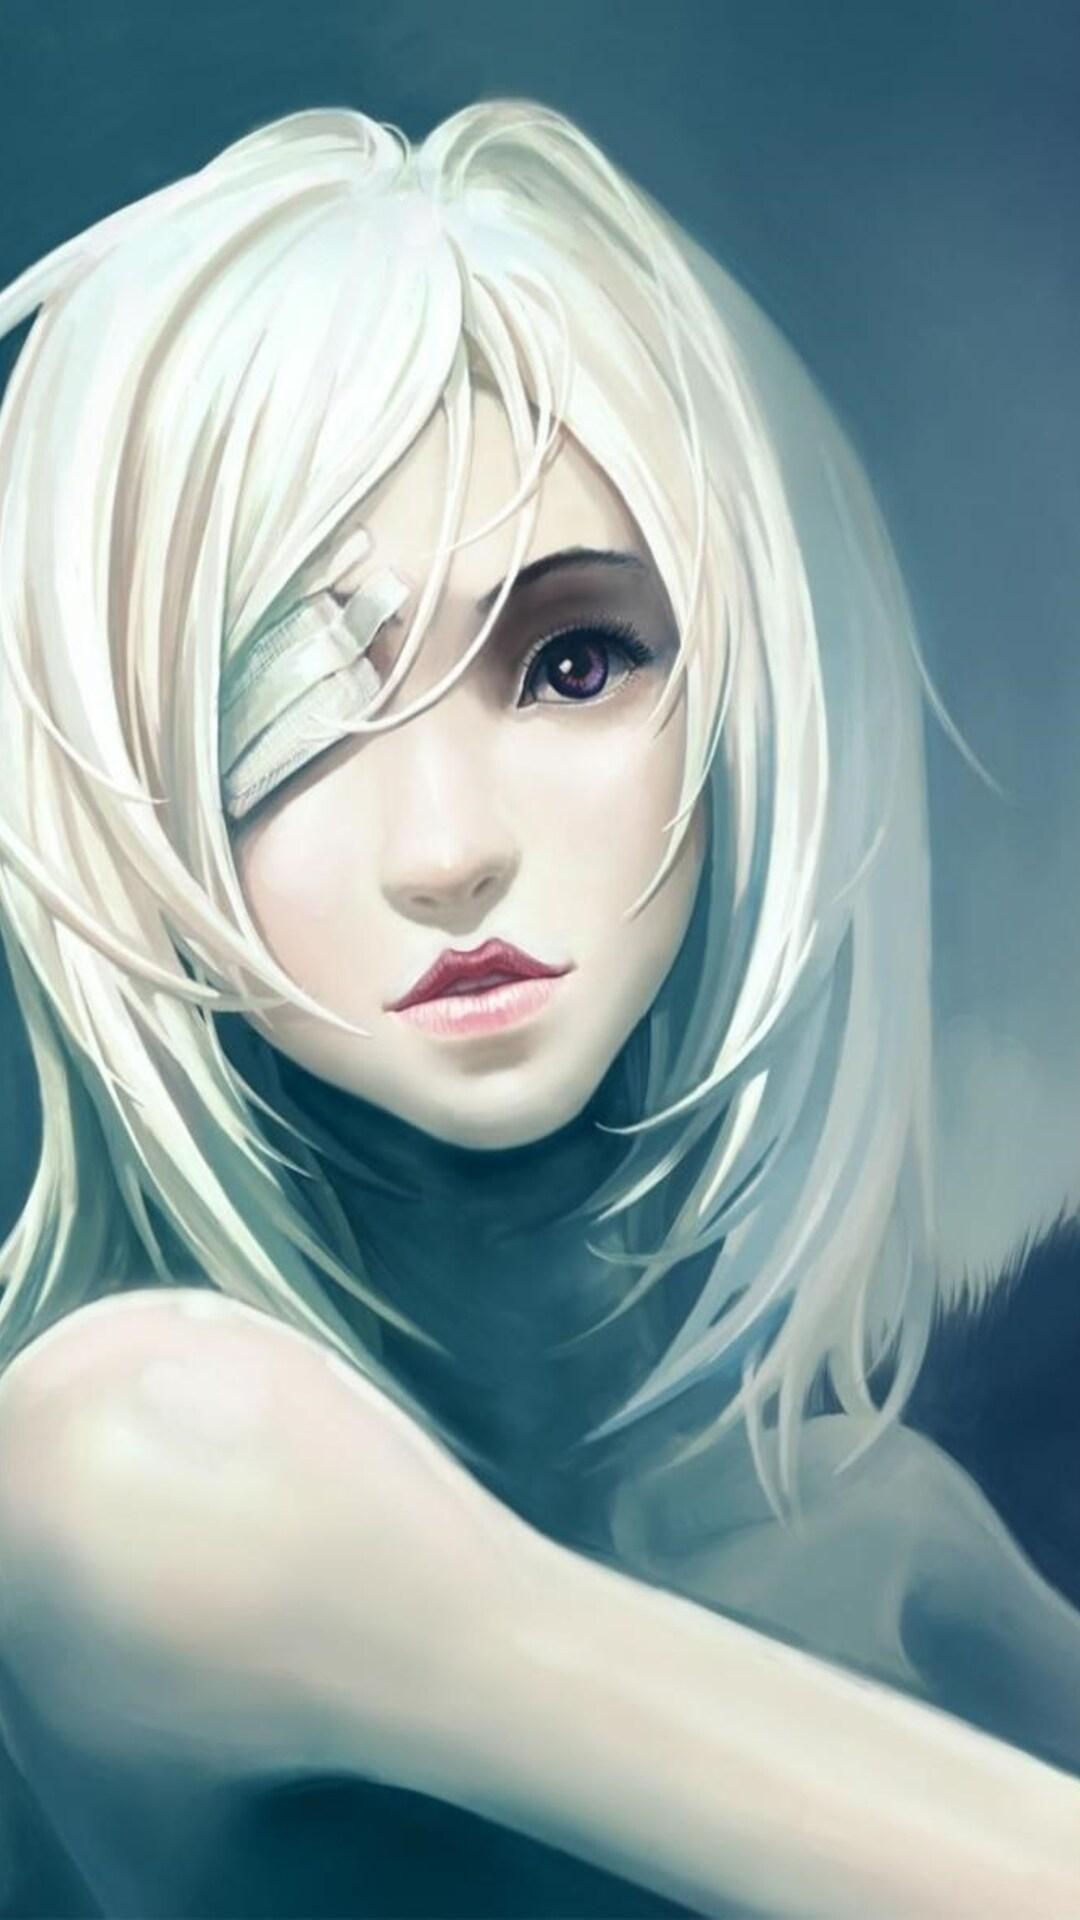 anime-angel-wide.jpg